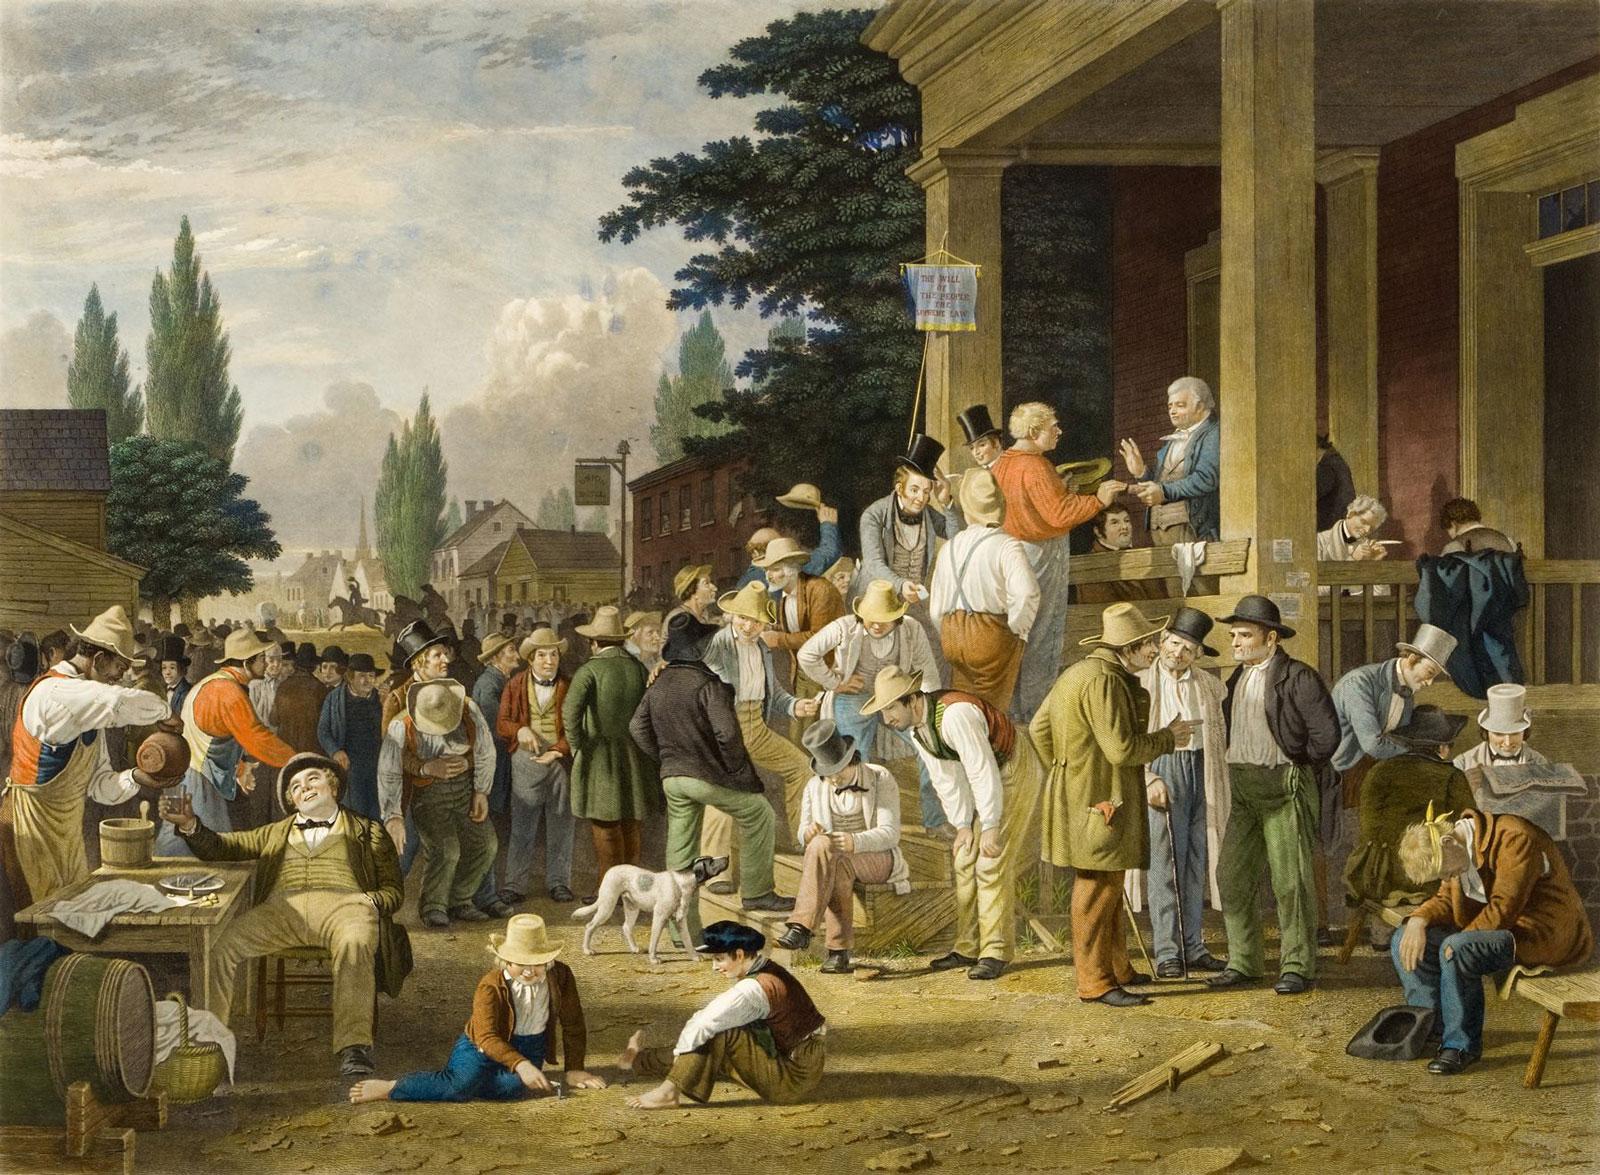 George Caleb Bingham: The County Election, 1854